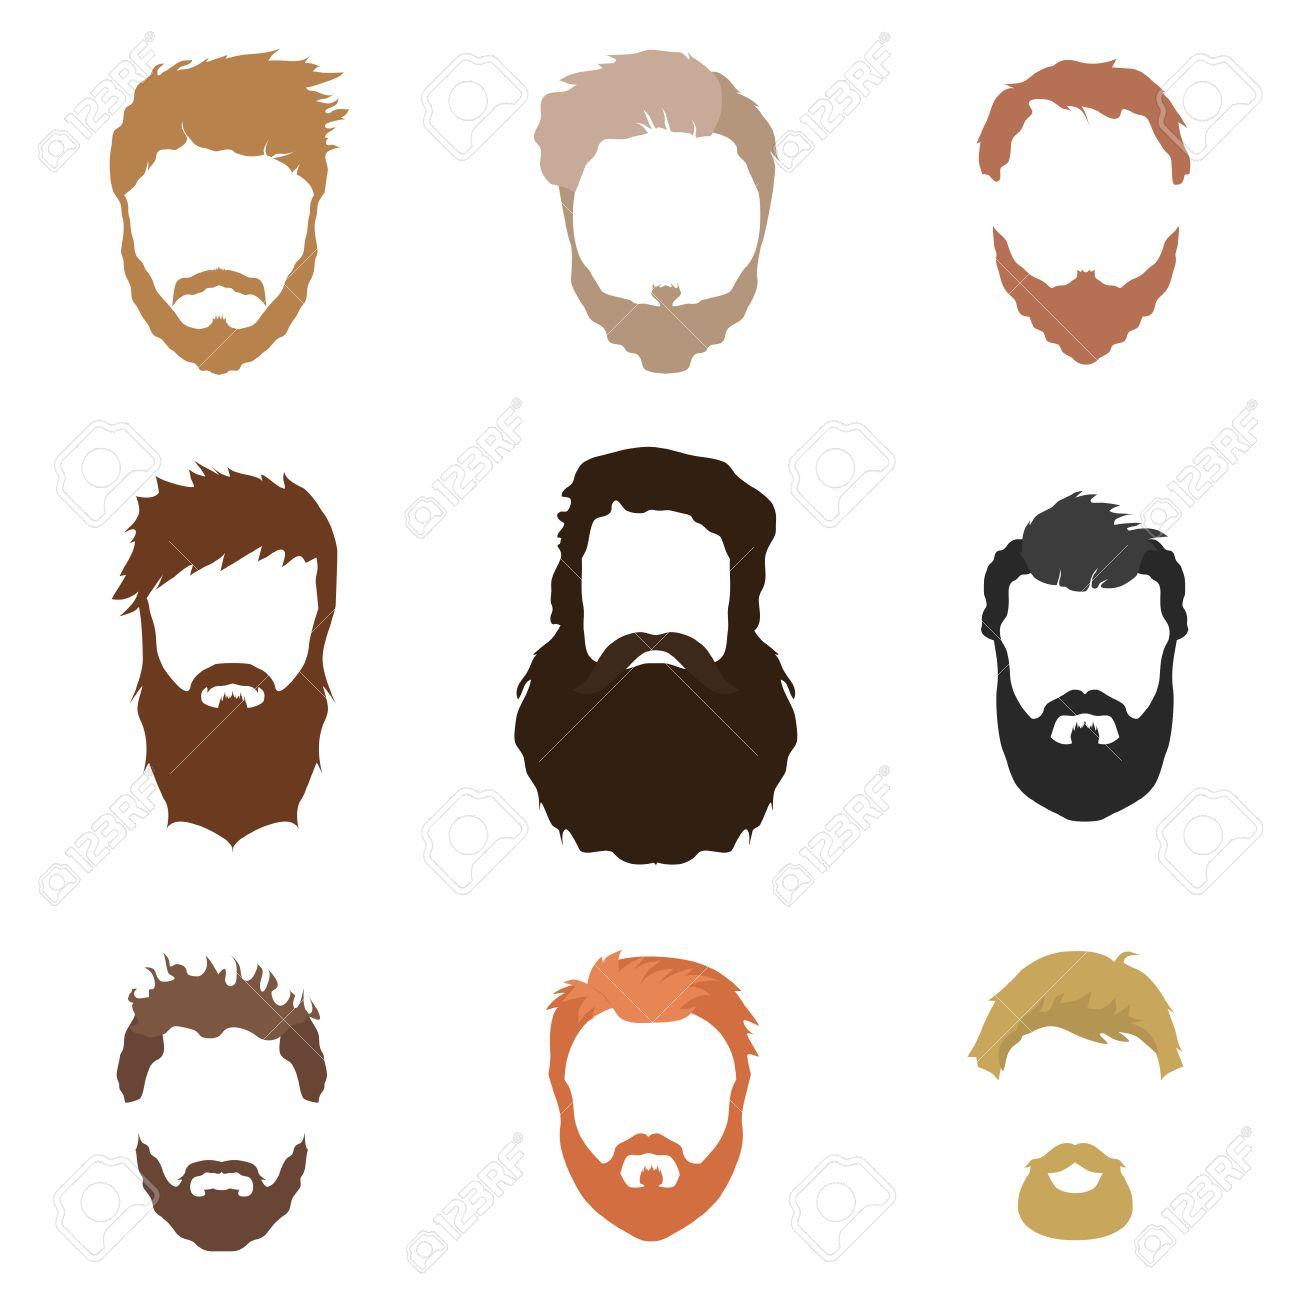 Hair, beard and face, hair, cut,out mask flat cartoon collections